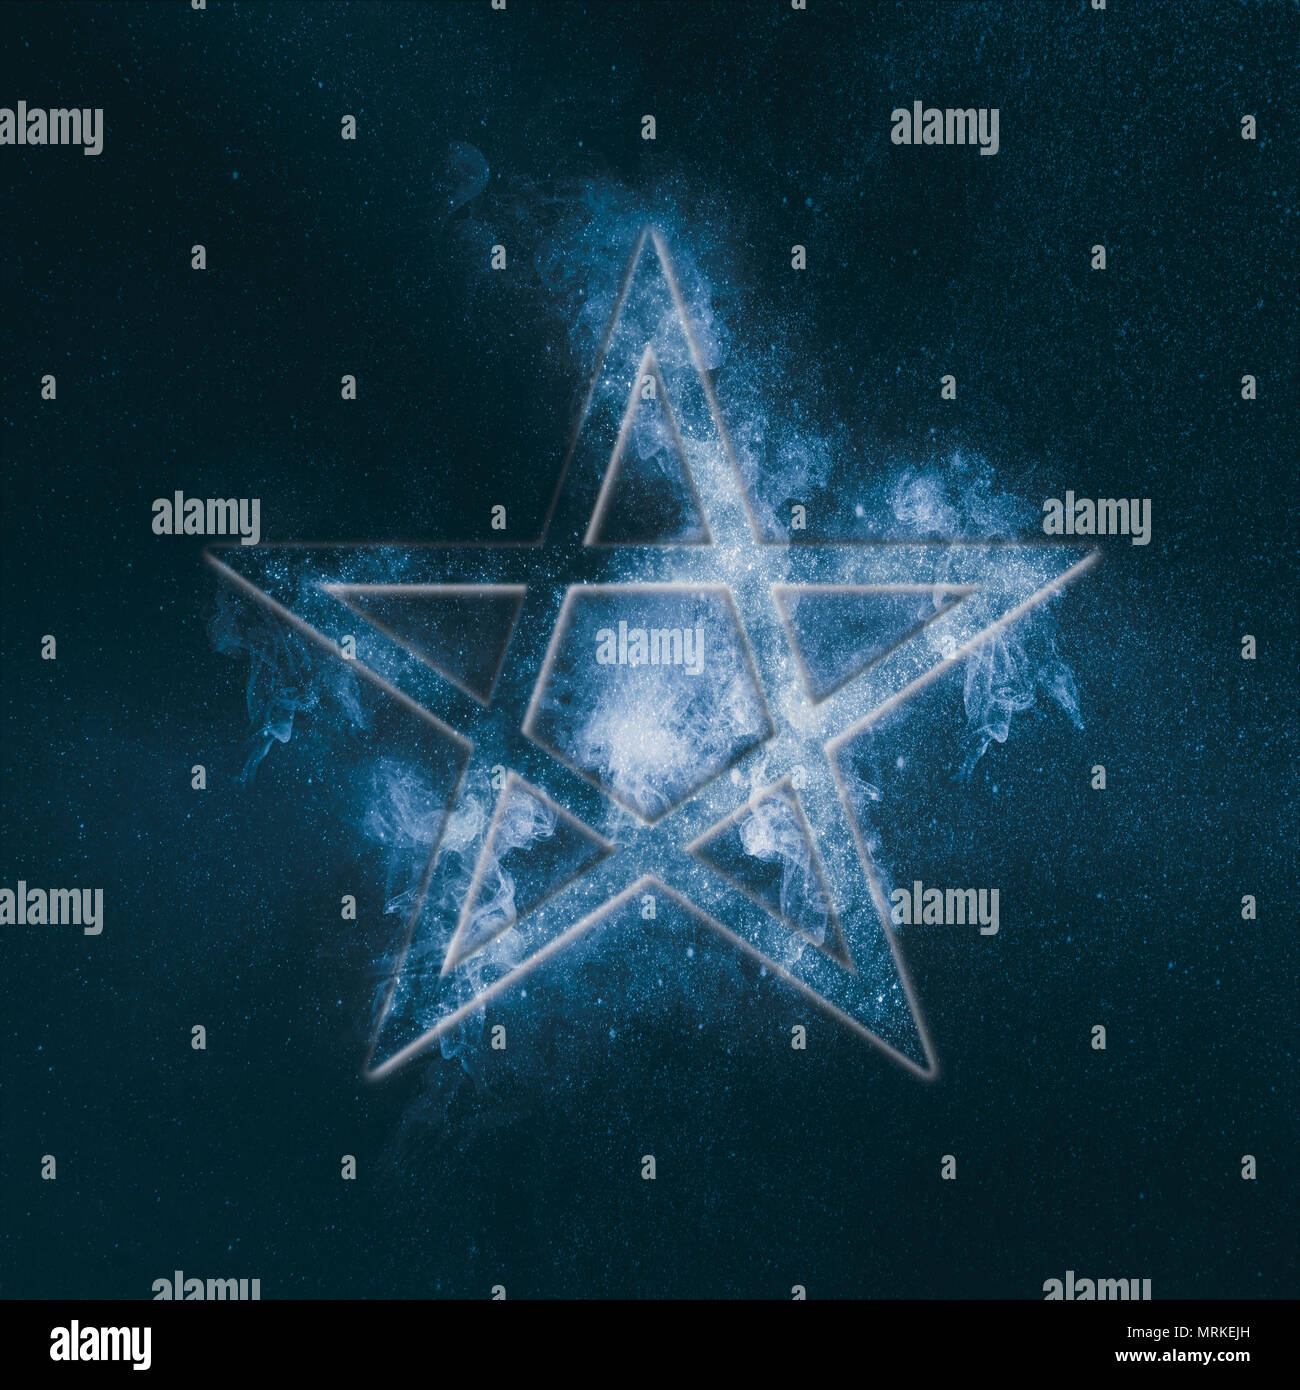 Pentagram Symbol Abstract Night Sky Background Stock Photo